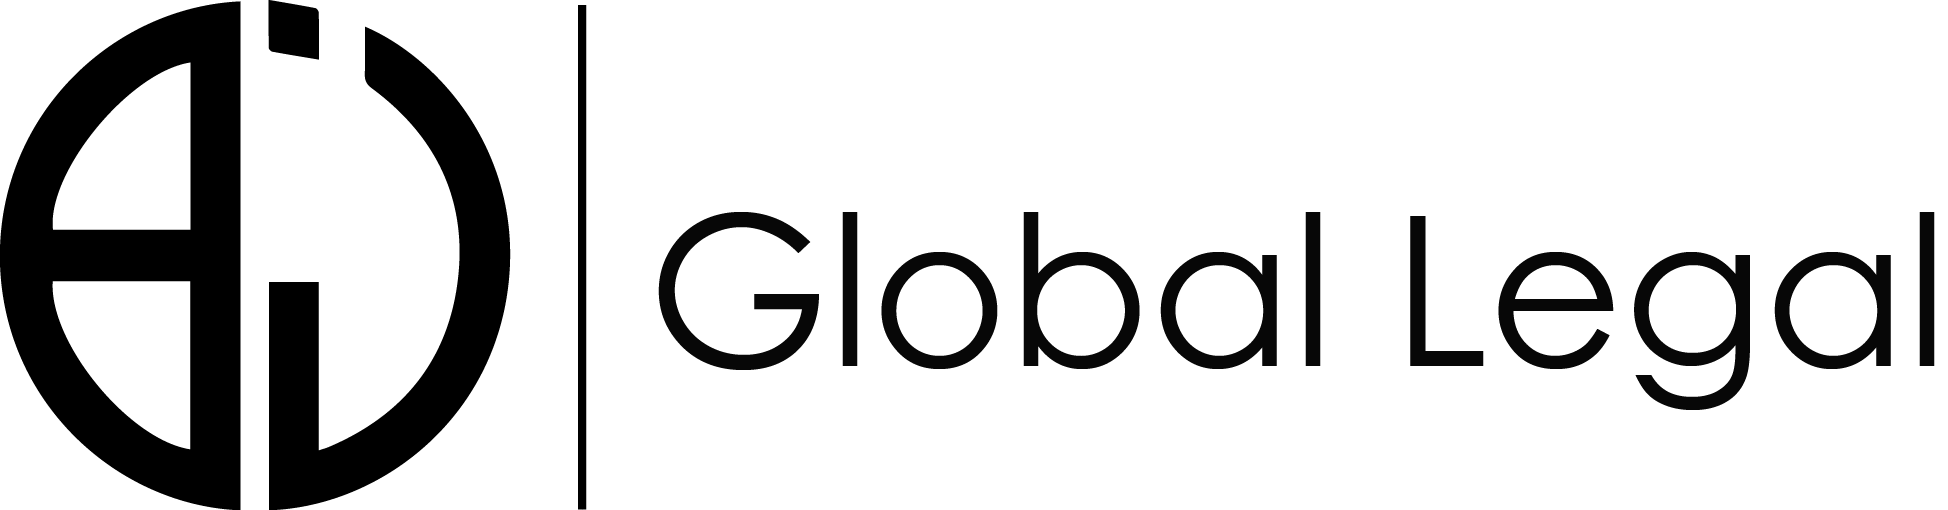 AJ Global Legal Services